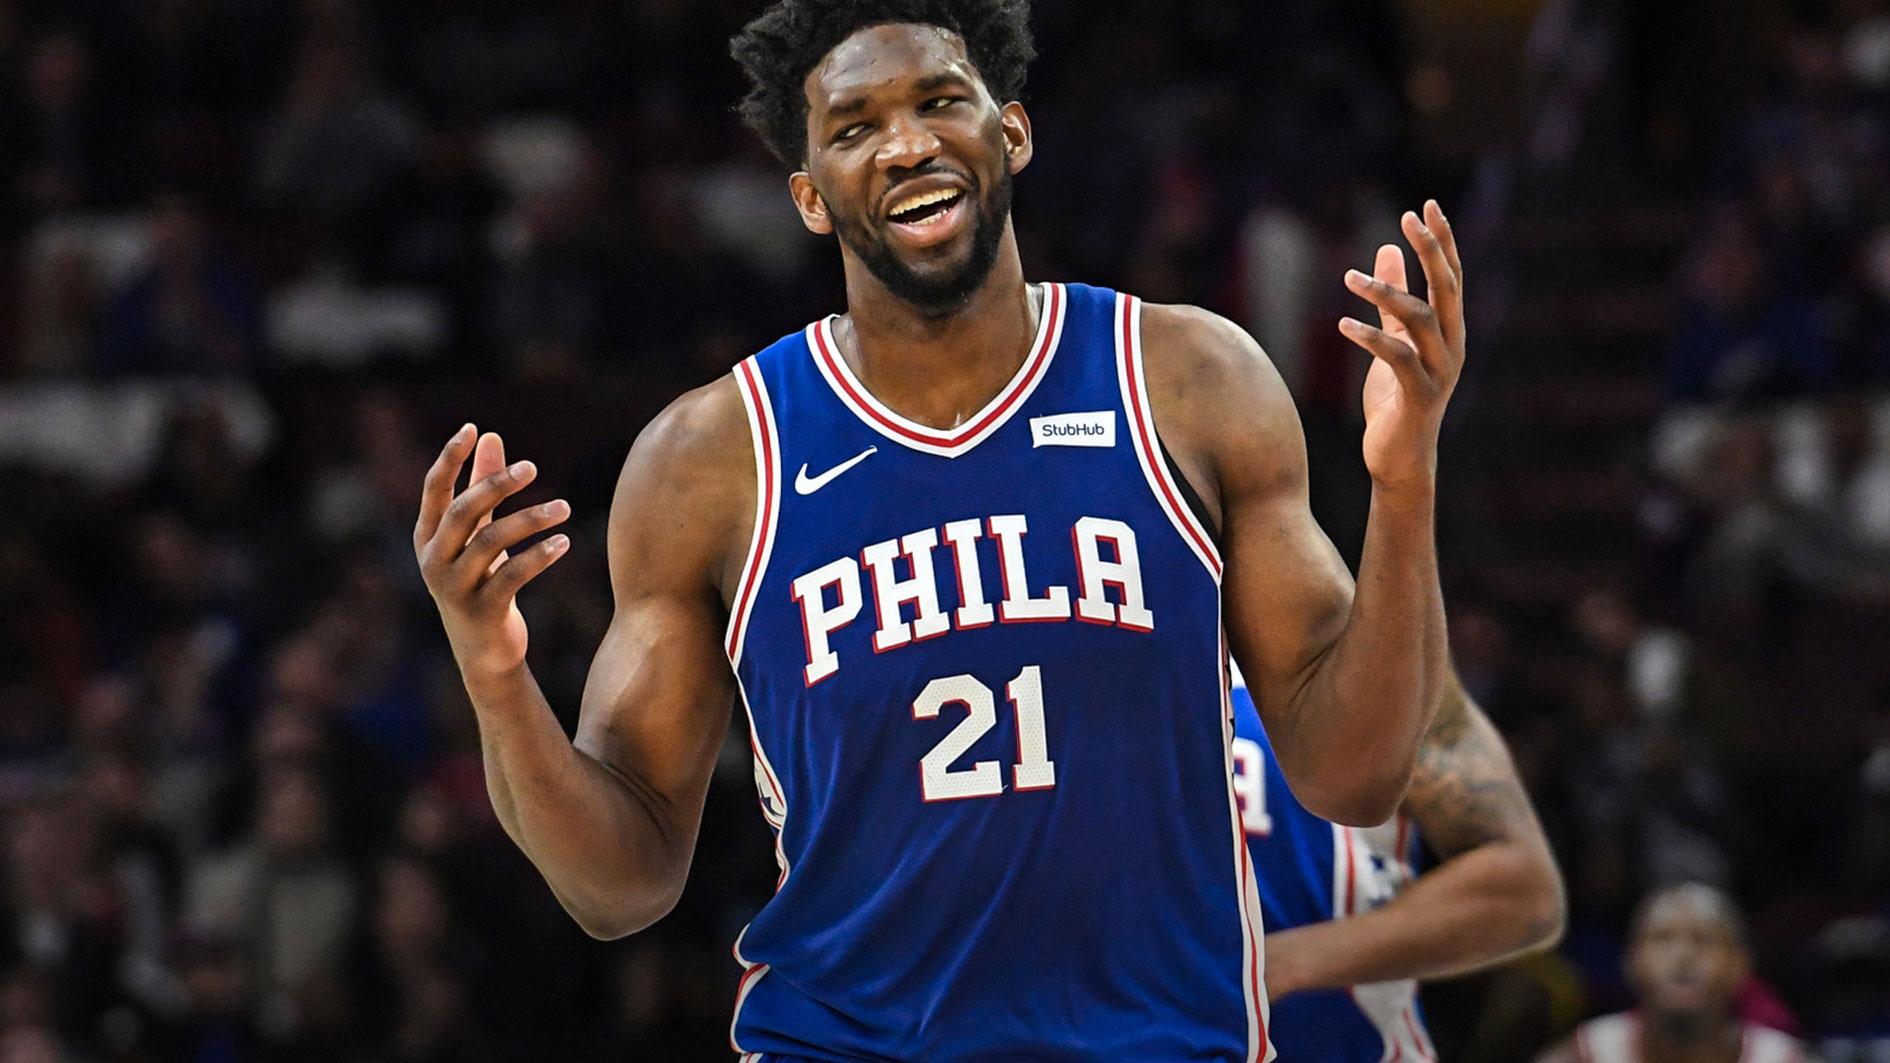 NBA Live 19 Cover Athlete Predictions